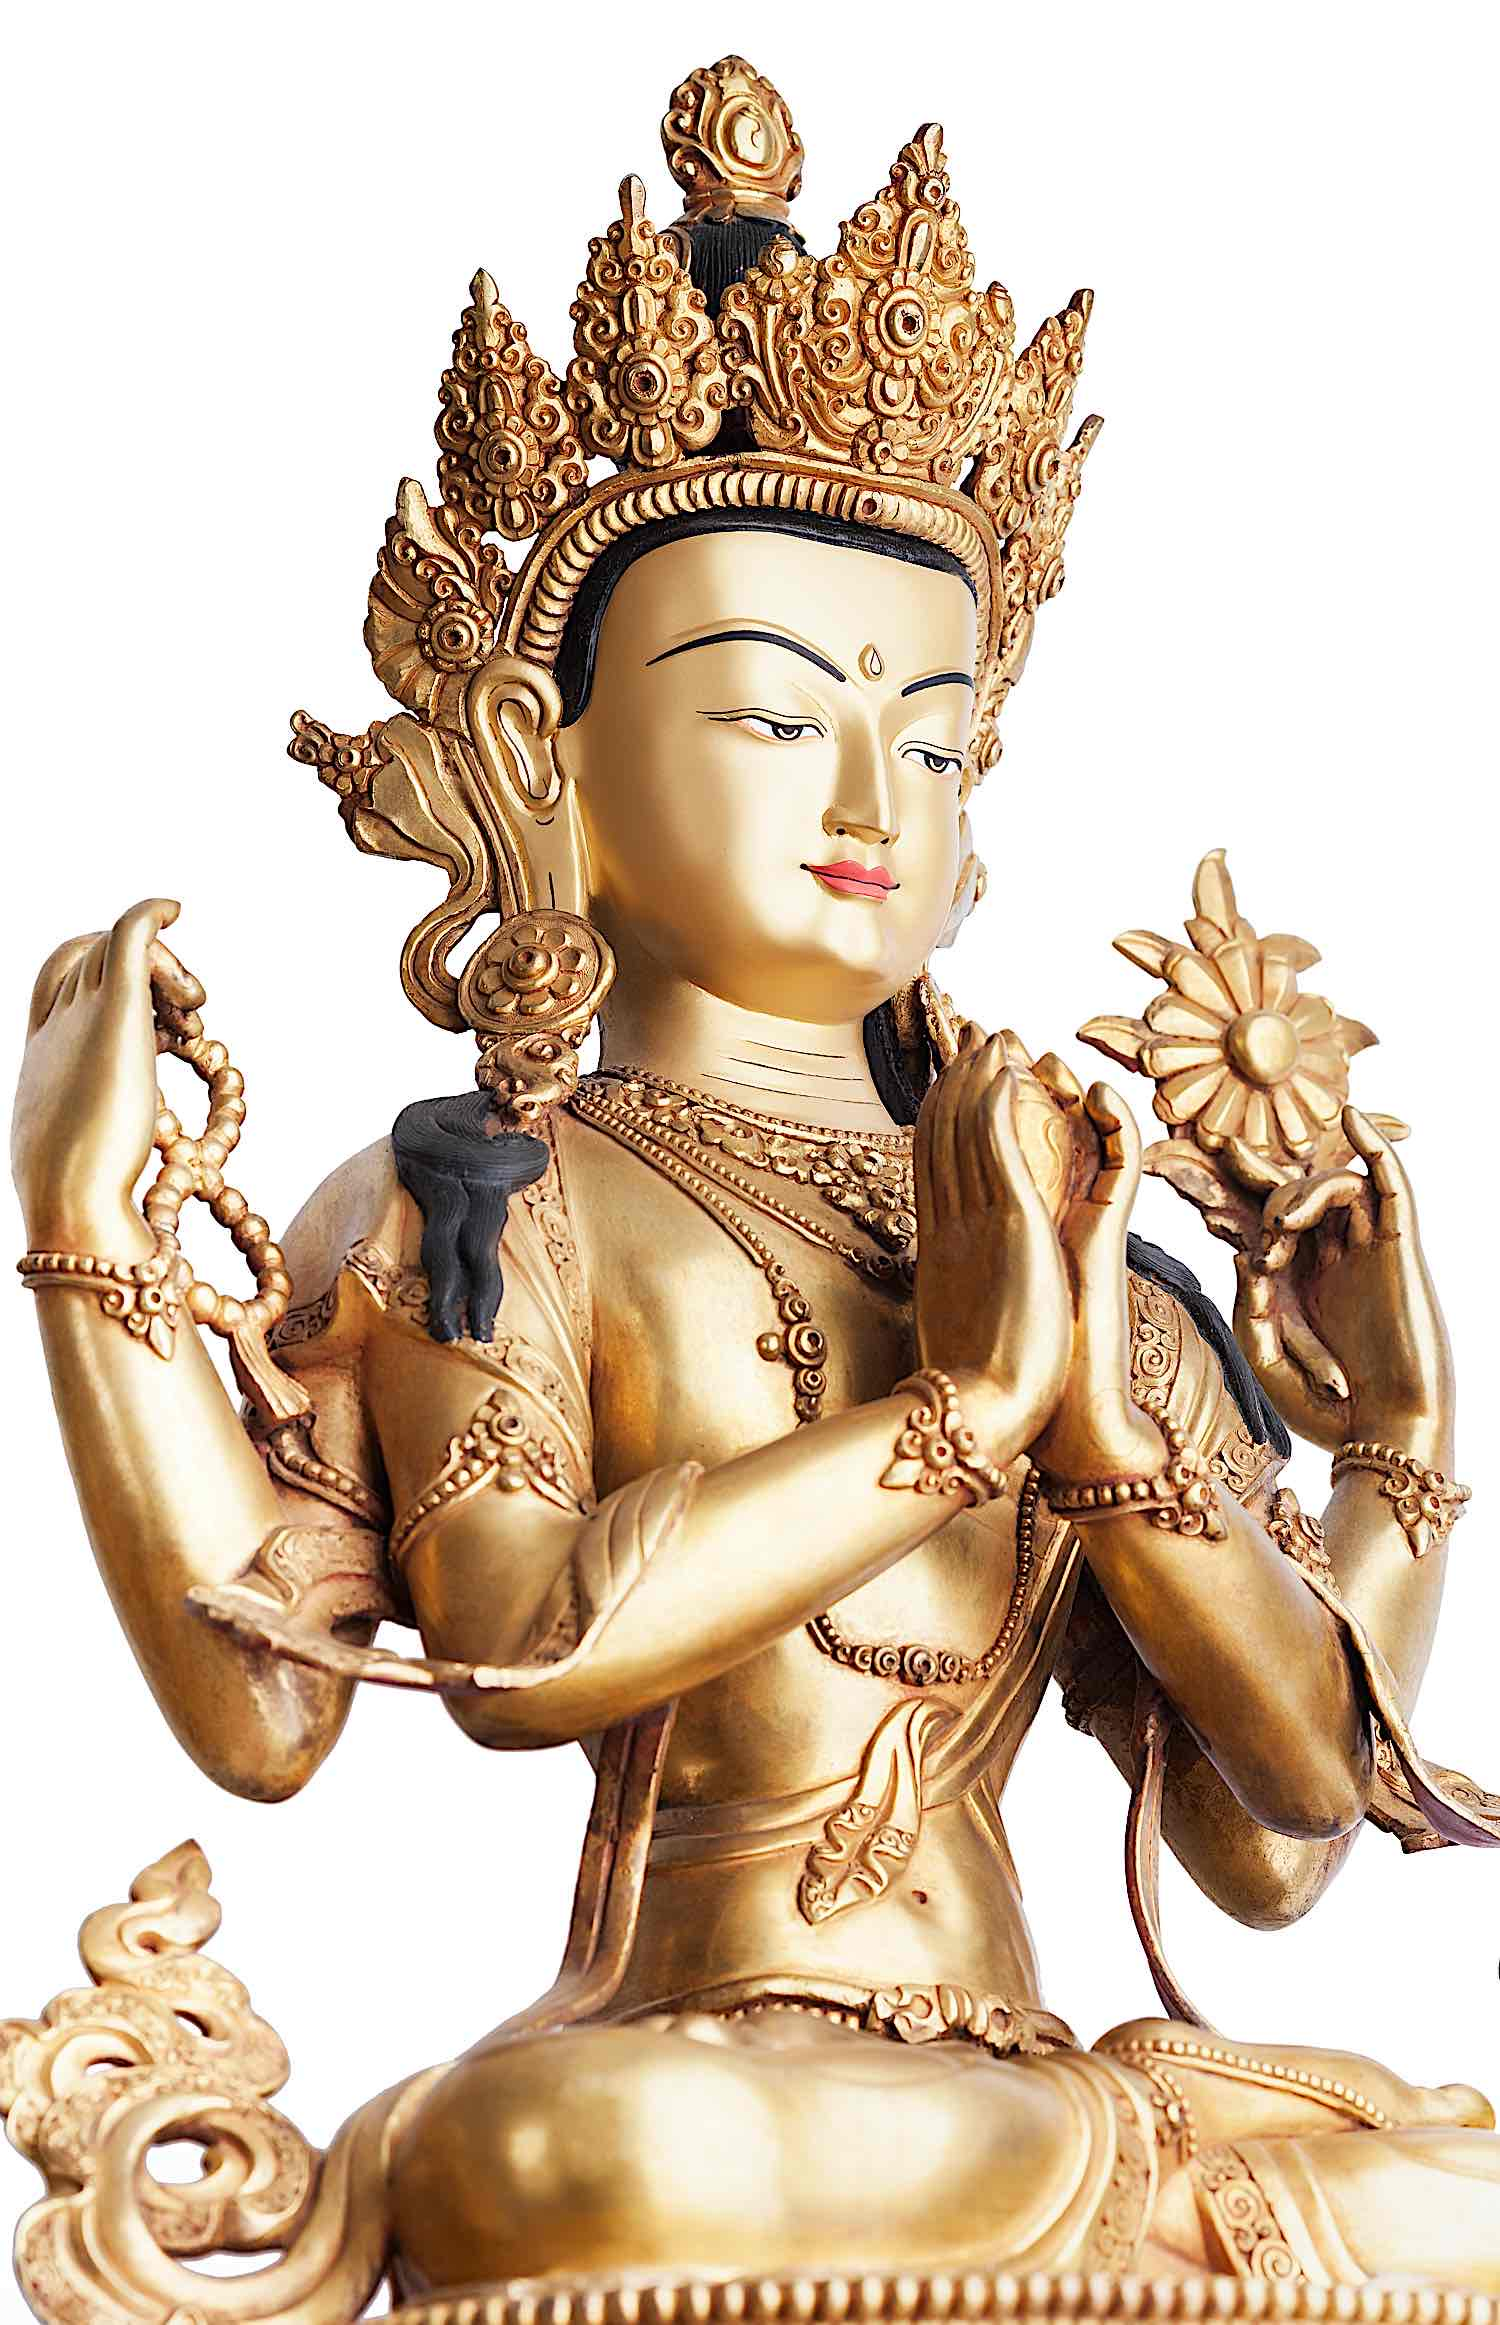 Buddha Weekly Four armed gilded statue of Chenrezig Tibetan dreamstime xxl 159537900 Buddhism